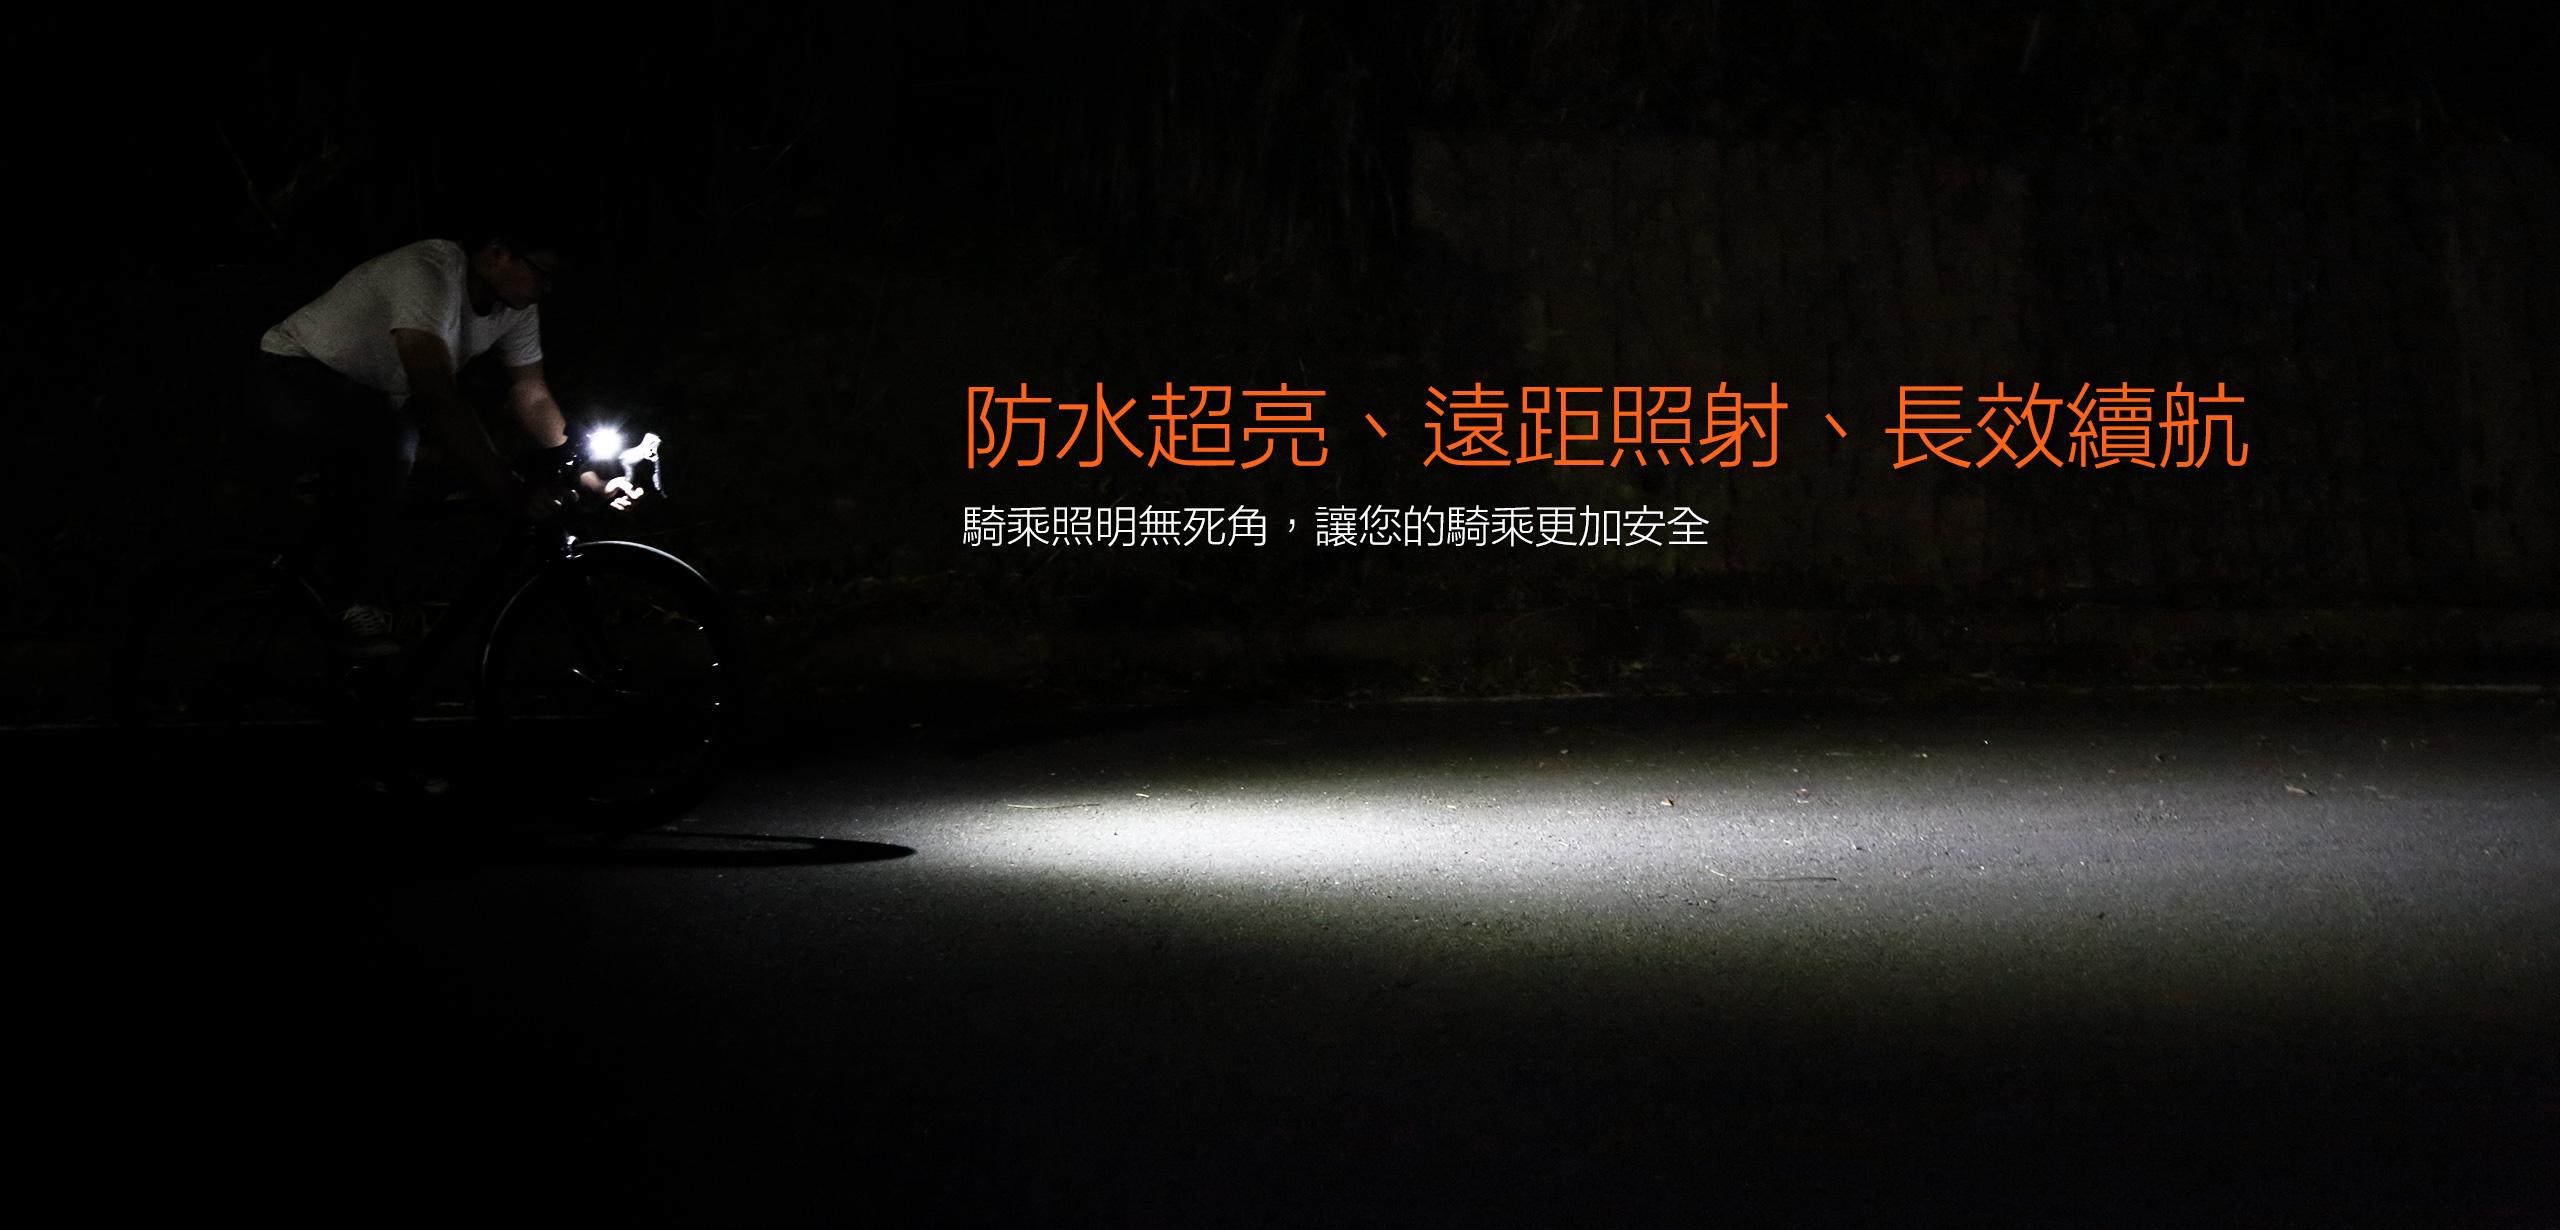 banner01_1003_zh